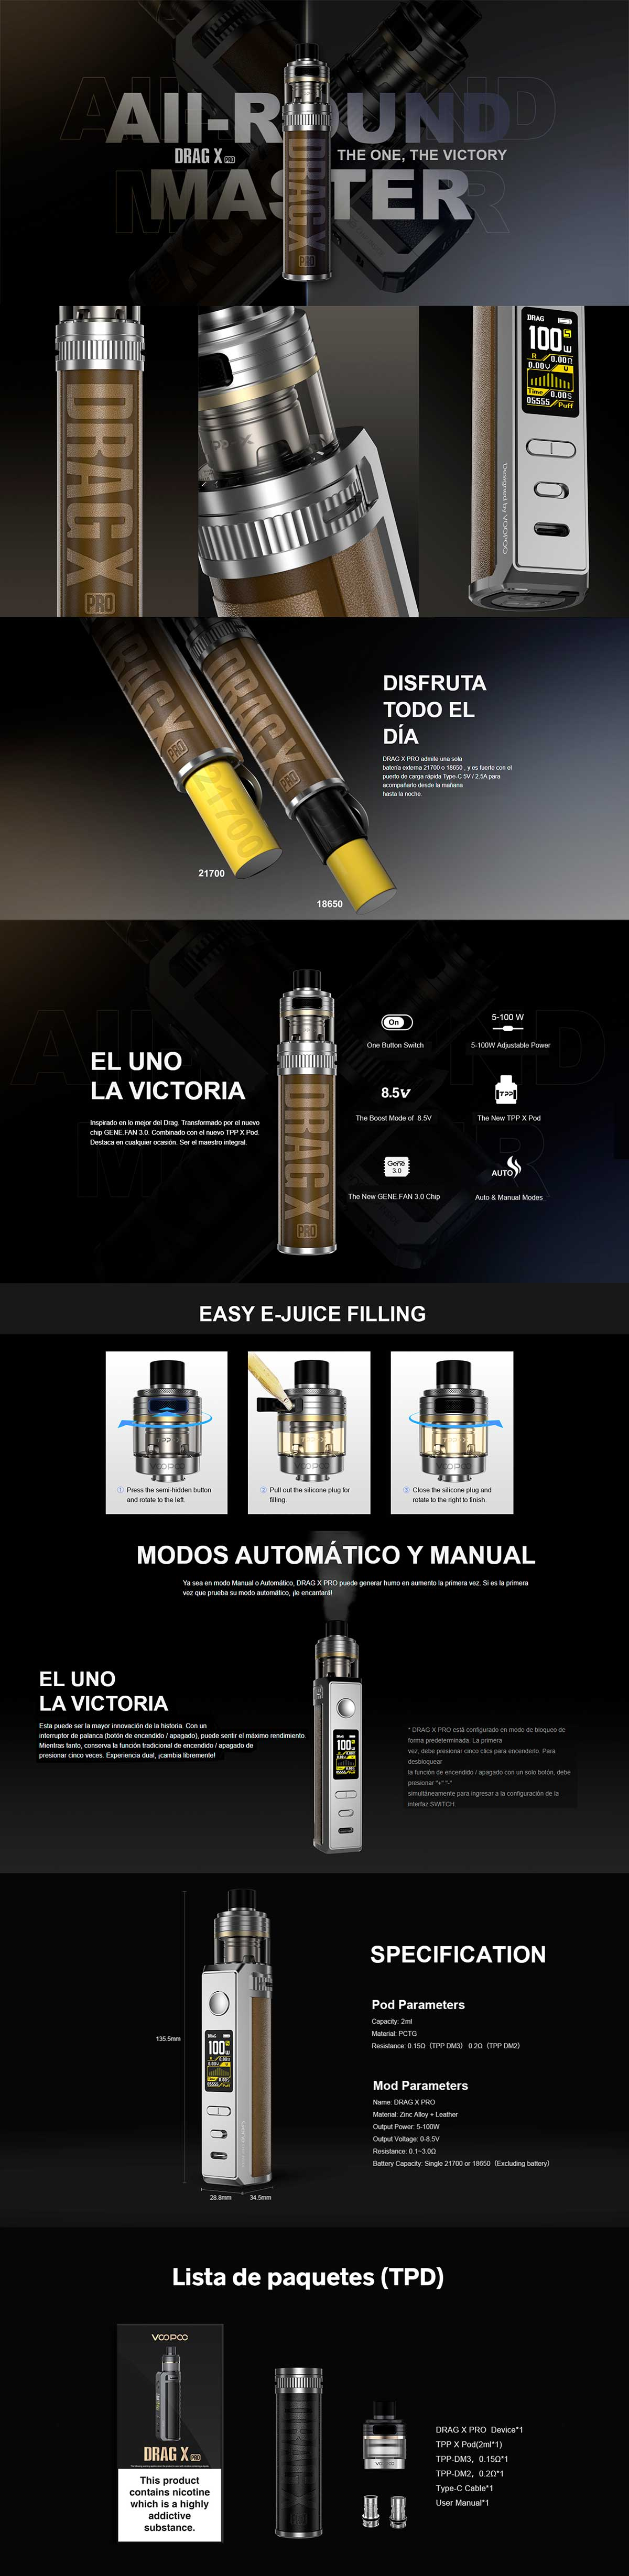 Drag X Pro Voopoo Mod Pod, detalle